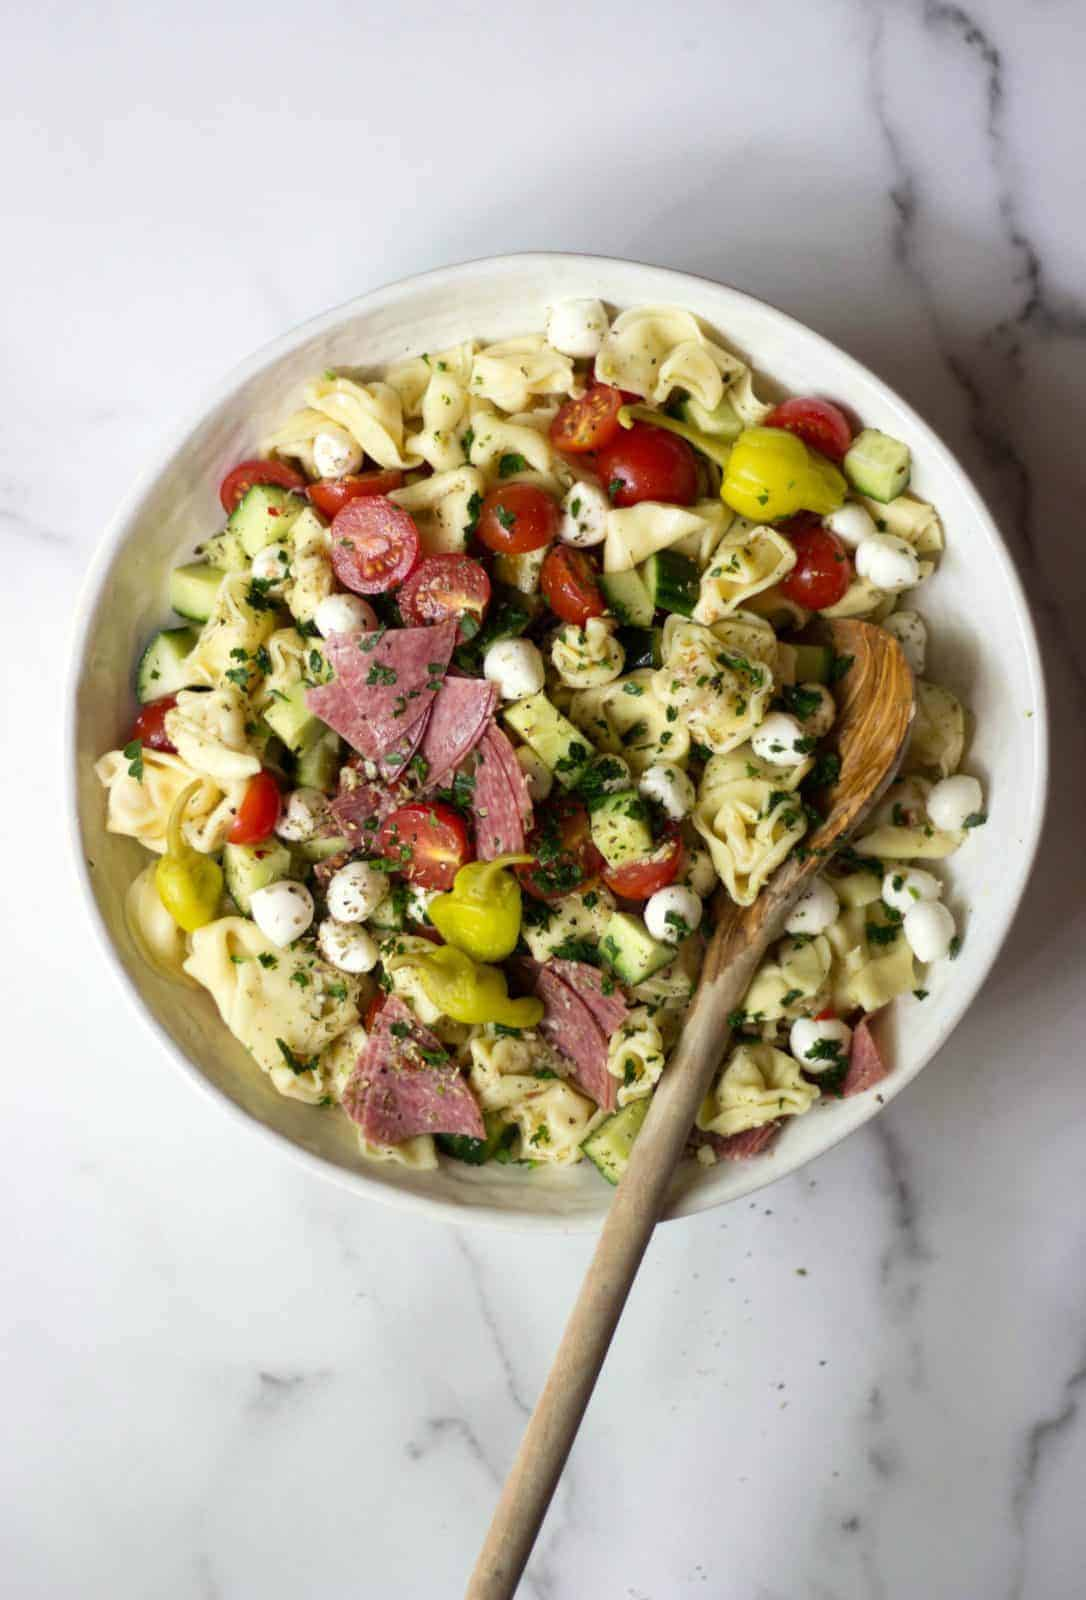 A summer Italian Tortellini Salad in a white bowl